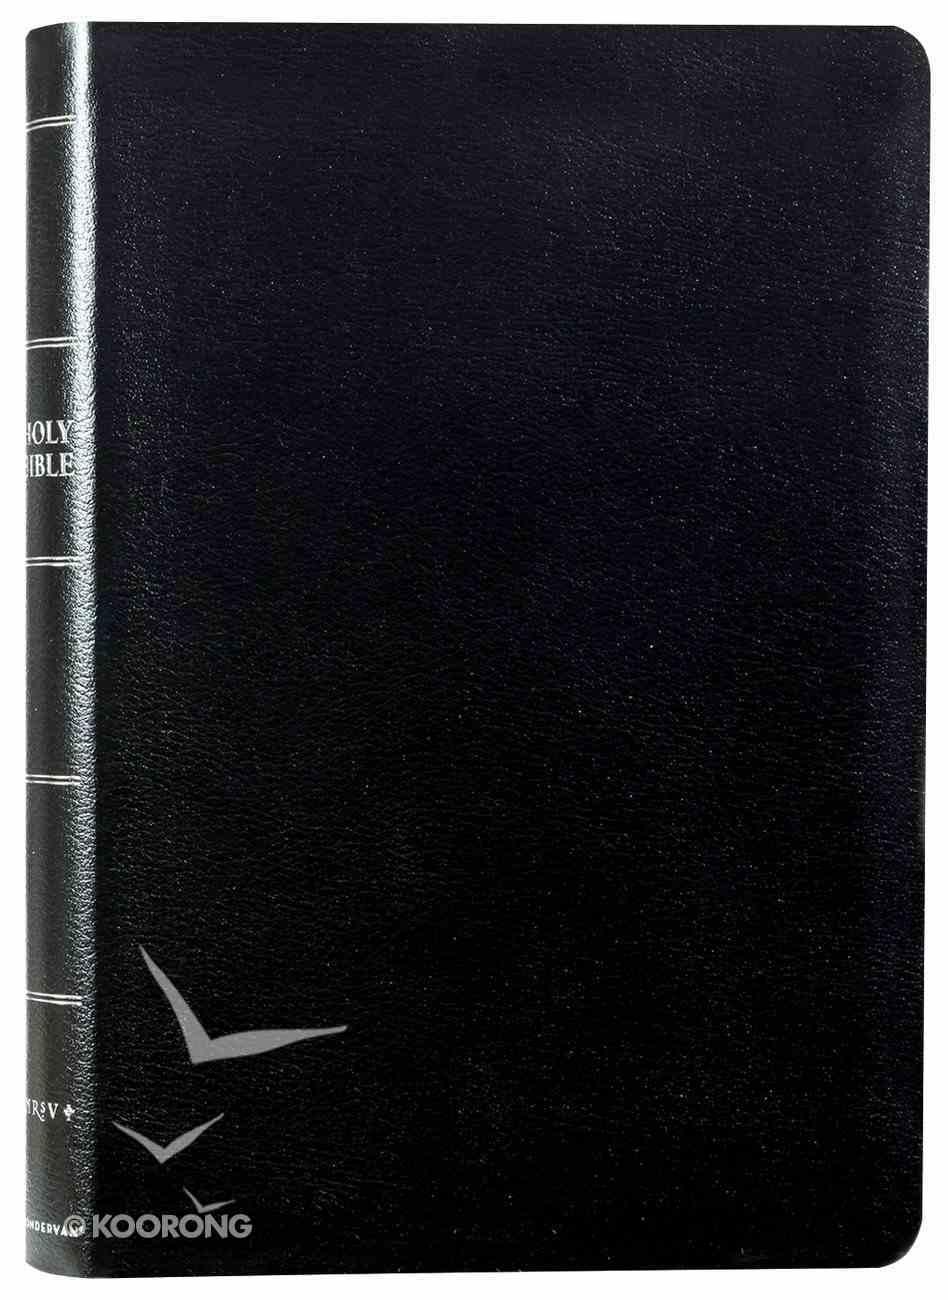 NRSV Thinline Bible Large Print Black Bonded Leather